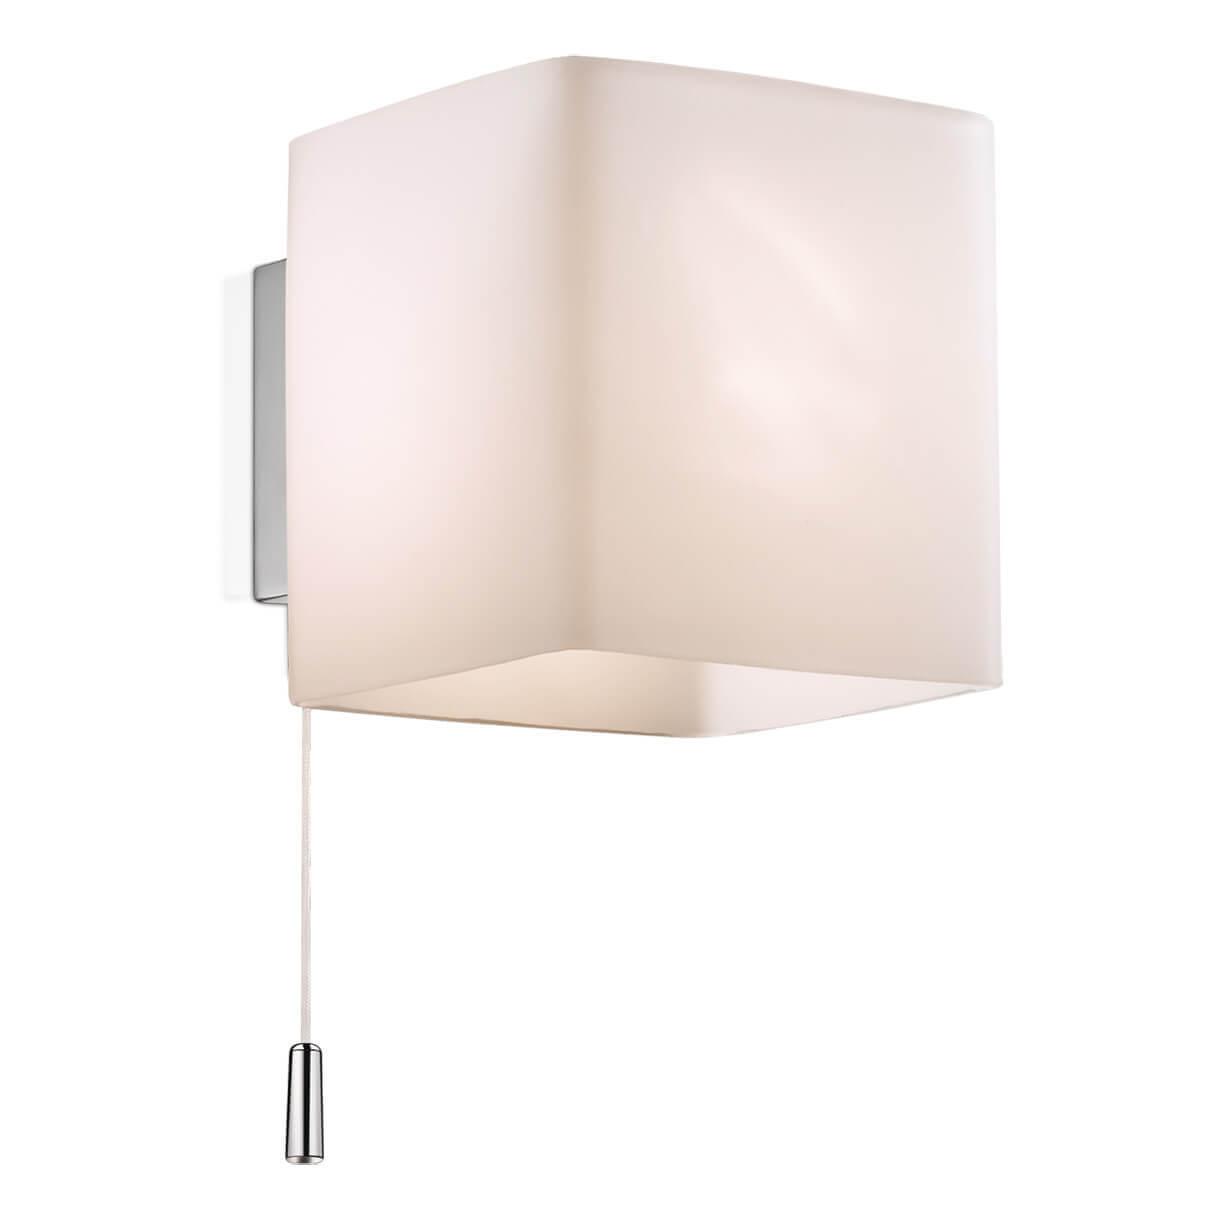 Бра Odeon Light Faro 2183/1W odeon light бра odeon light 2920 1w